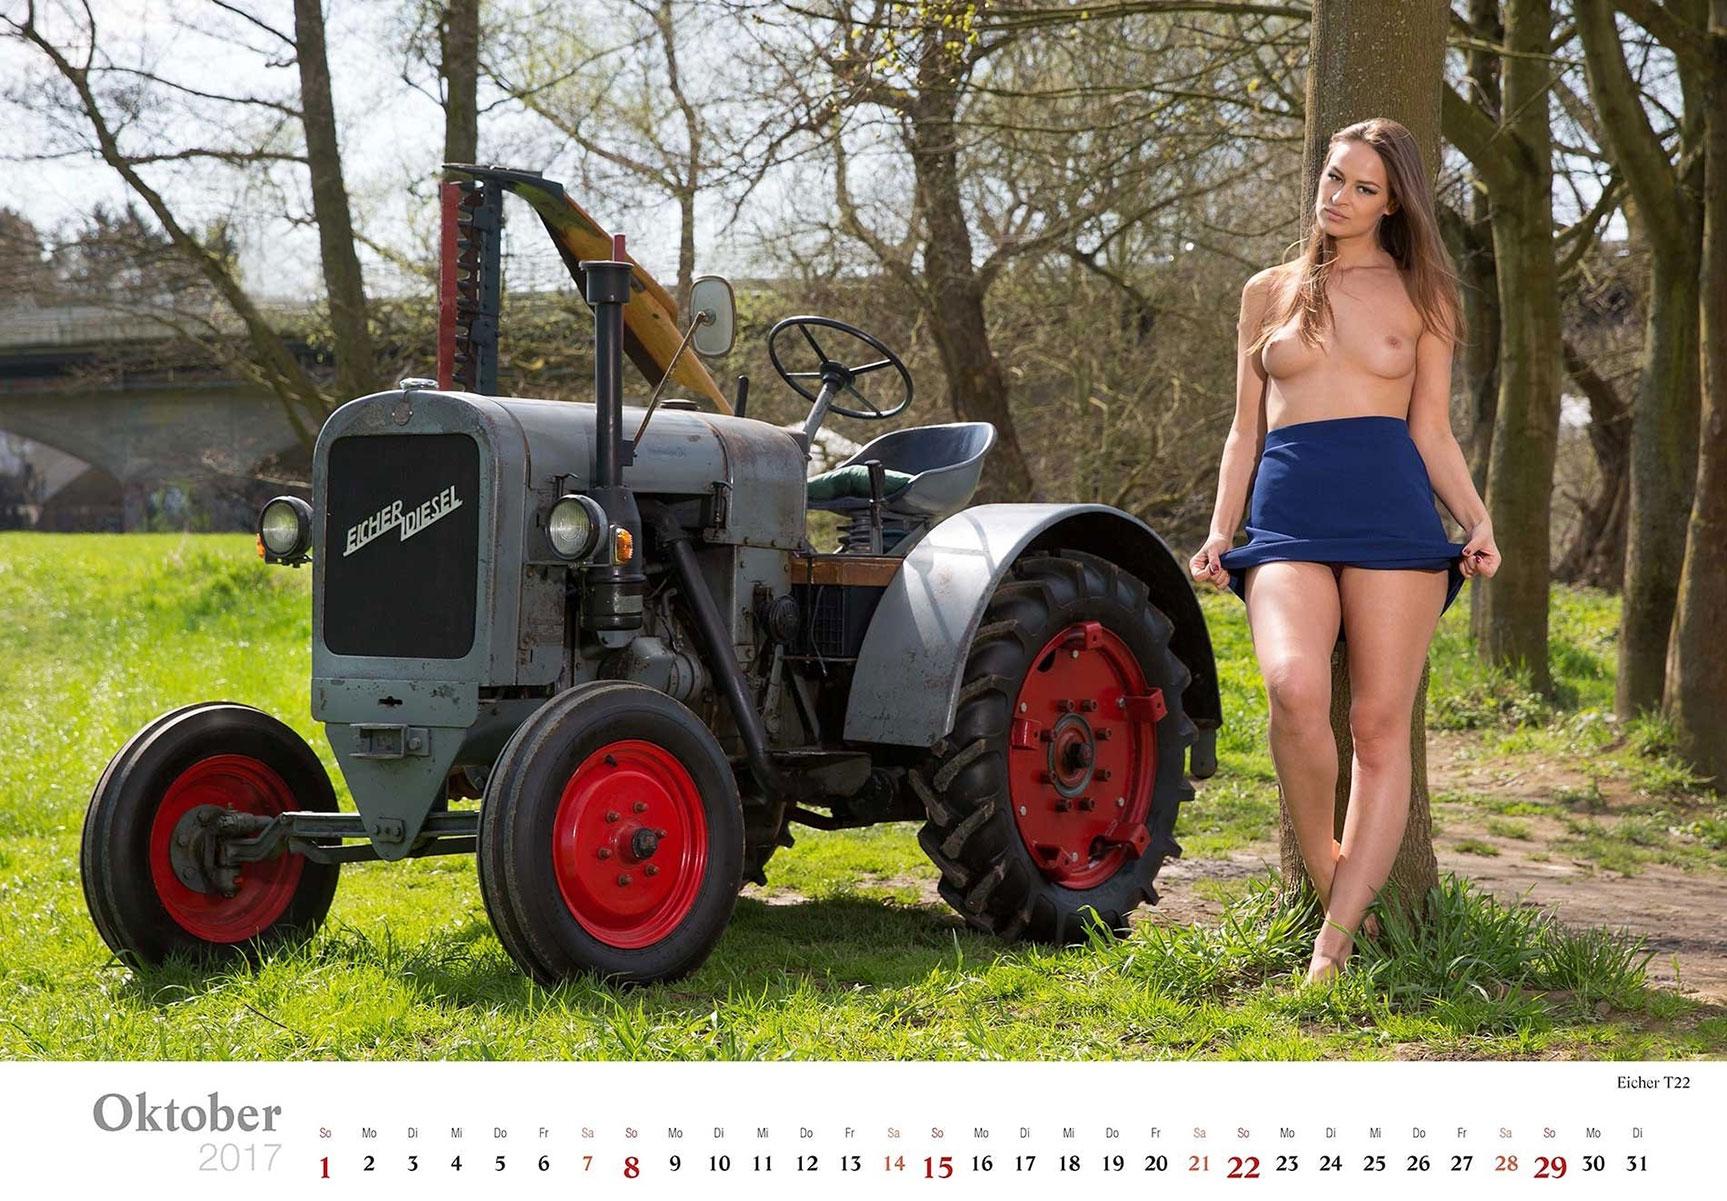 Девушки и трактора в эротическом календаре 2017 / Eicher T22 - Jungbauerntraume calendar 2017